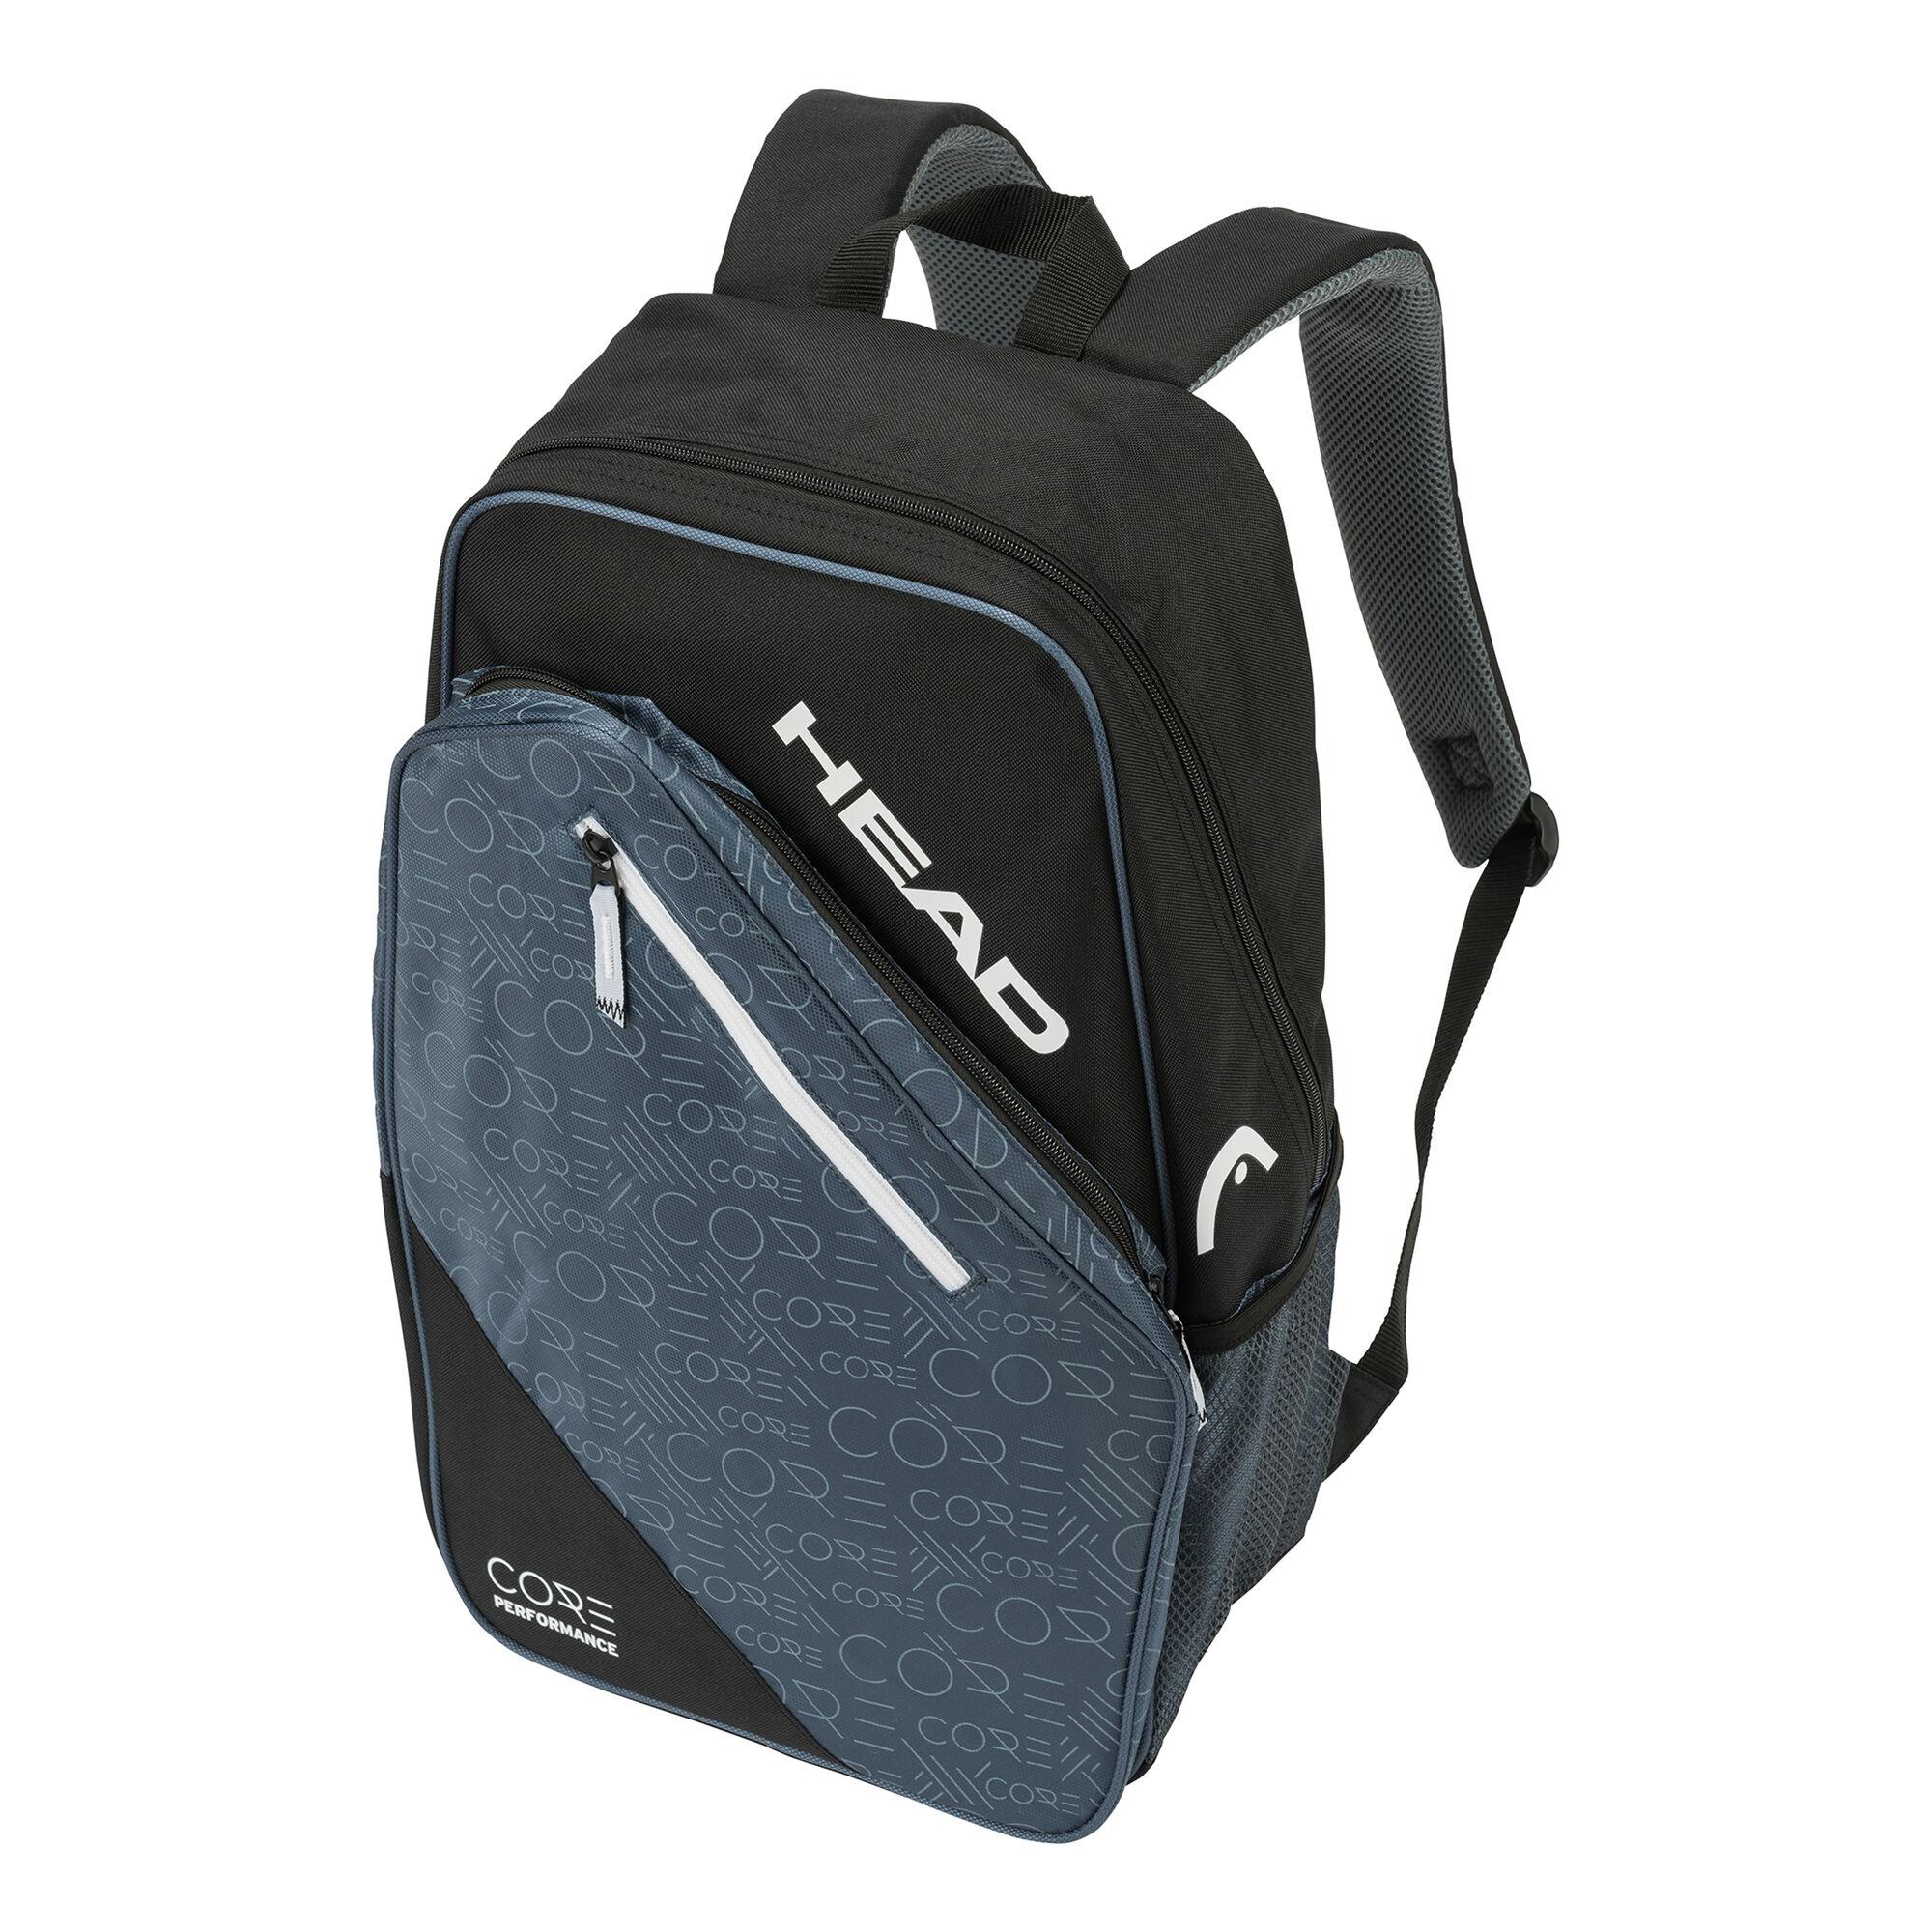 1327886b943 HEAD Core Backpack Rugzak - Zwart, Wit online kopen   Tennis-Point